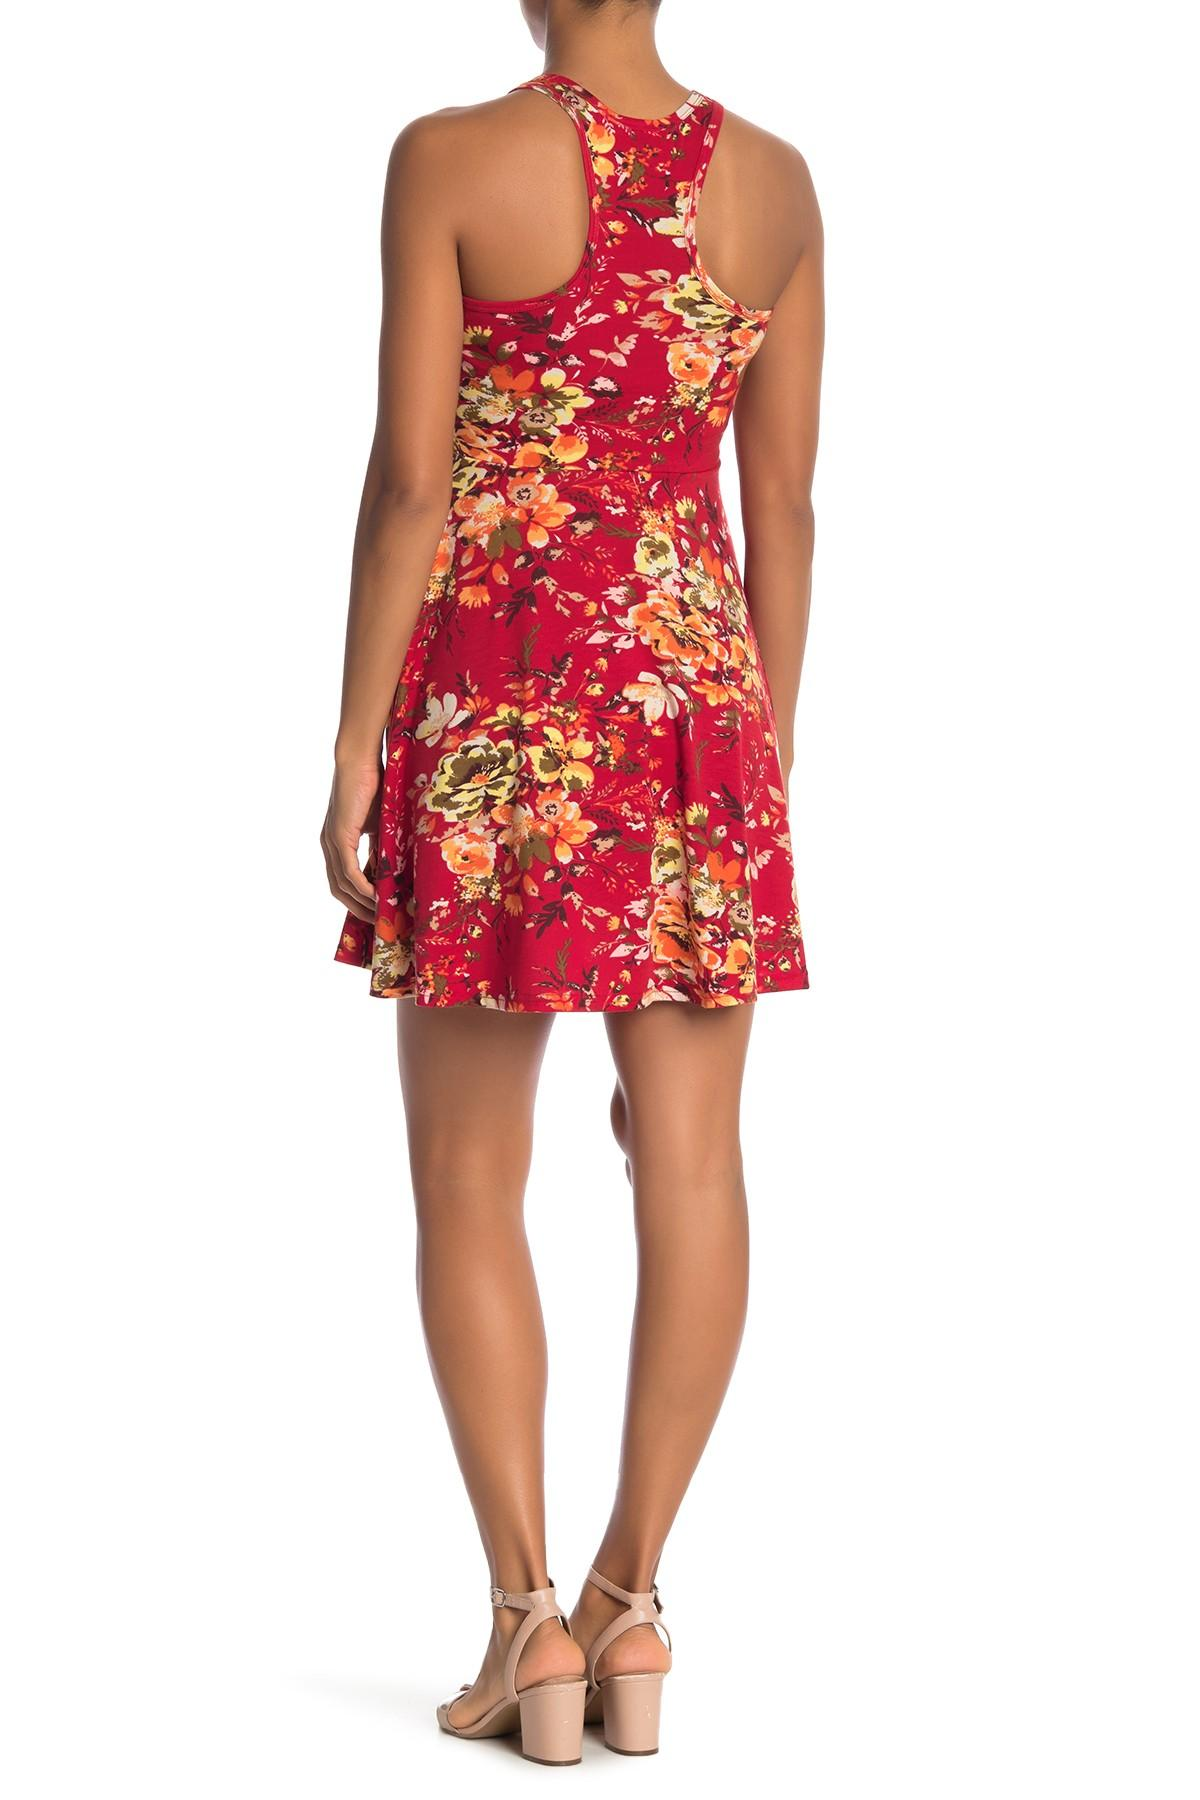 Angie - Red Racerback Knit Skater Dress - Lyst. View fullscreen 6d676a62c